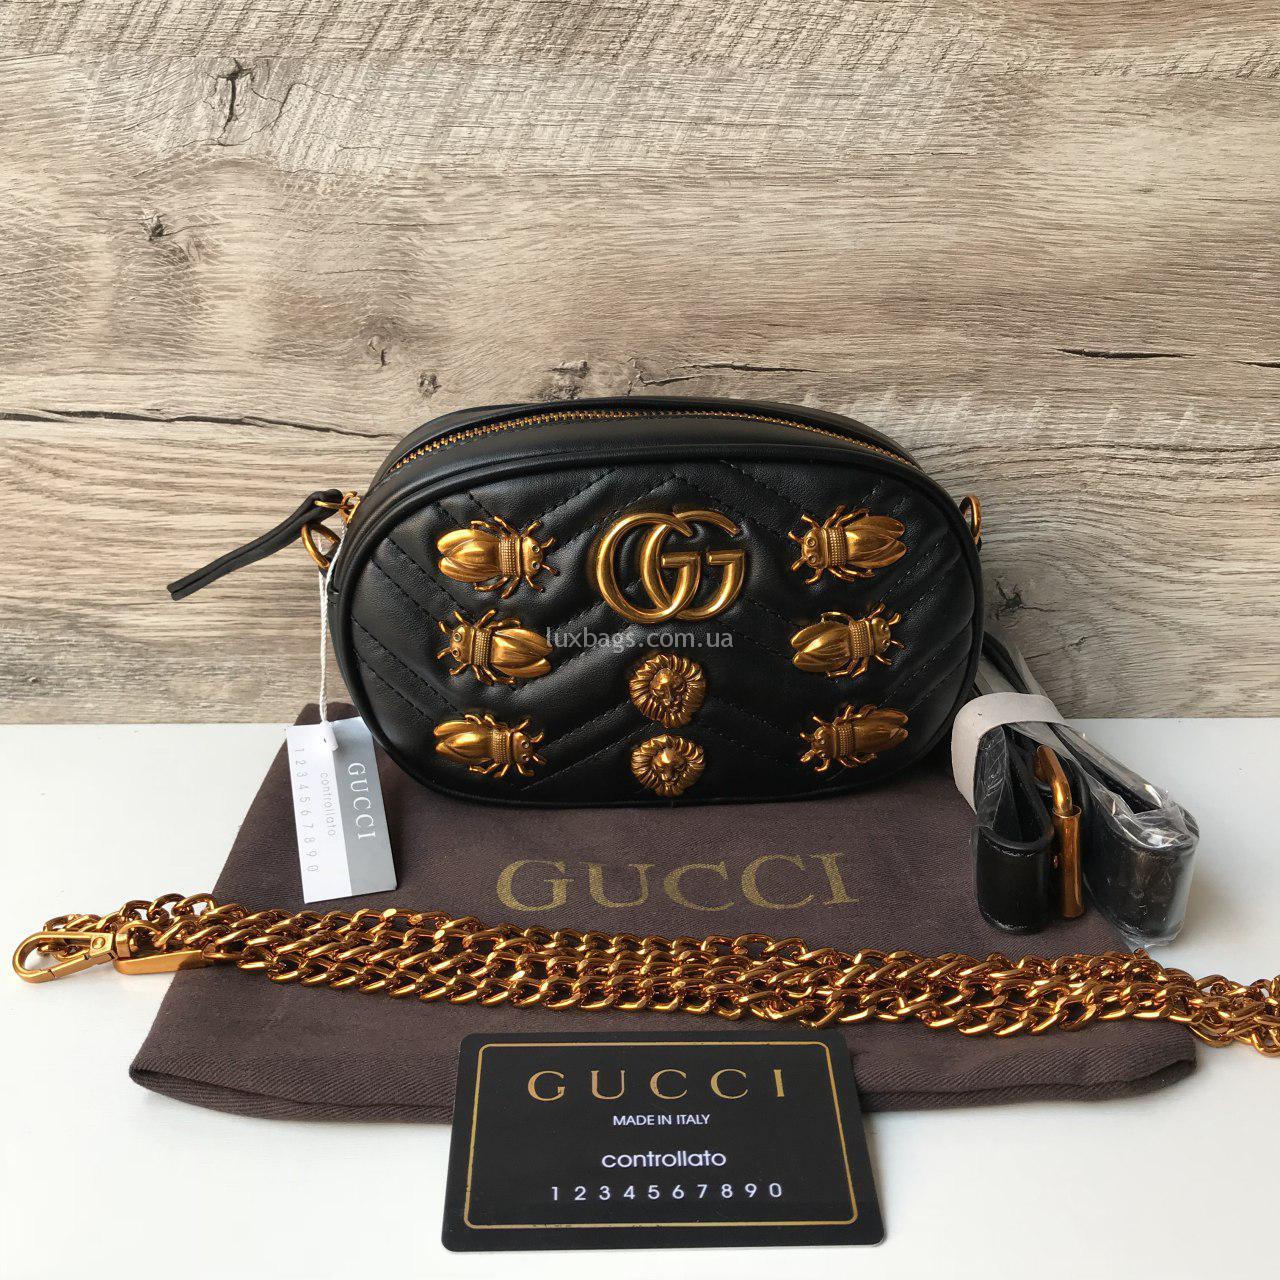 9b1eee58bd7b Посяная сумка Gucci (Гуччи) женская - Купить на lux-bags